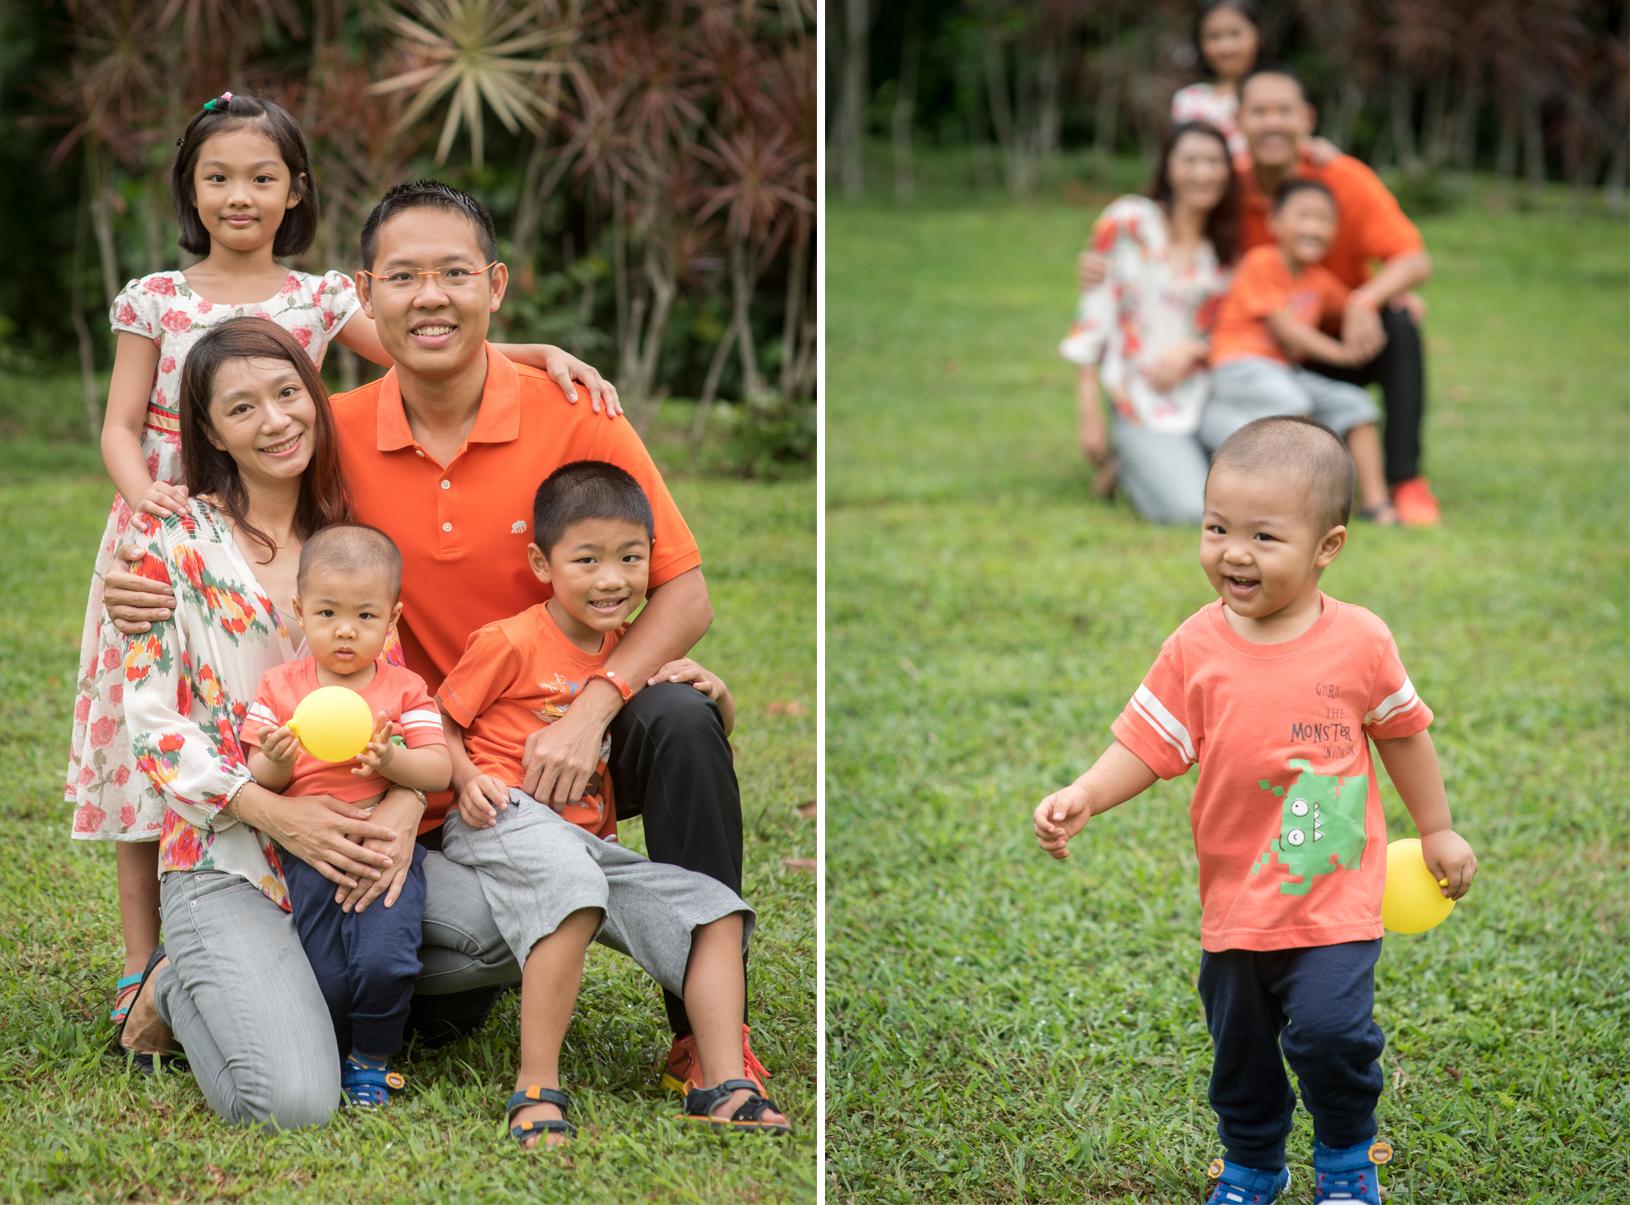 ang-mo-kio-park-family-05